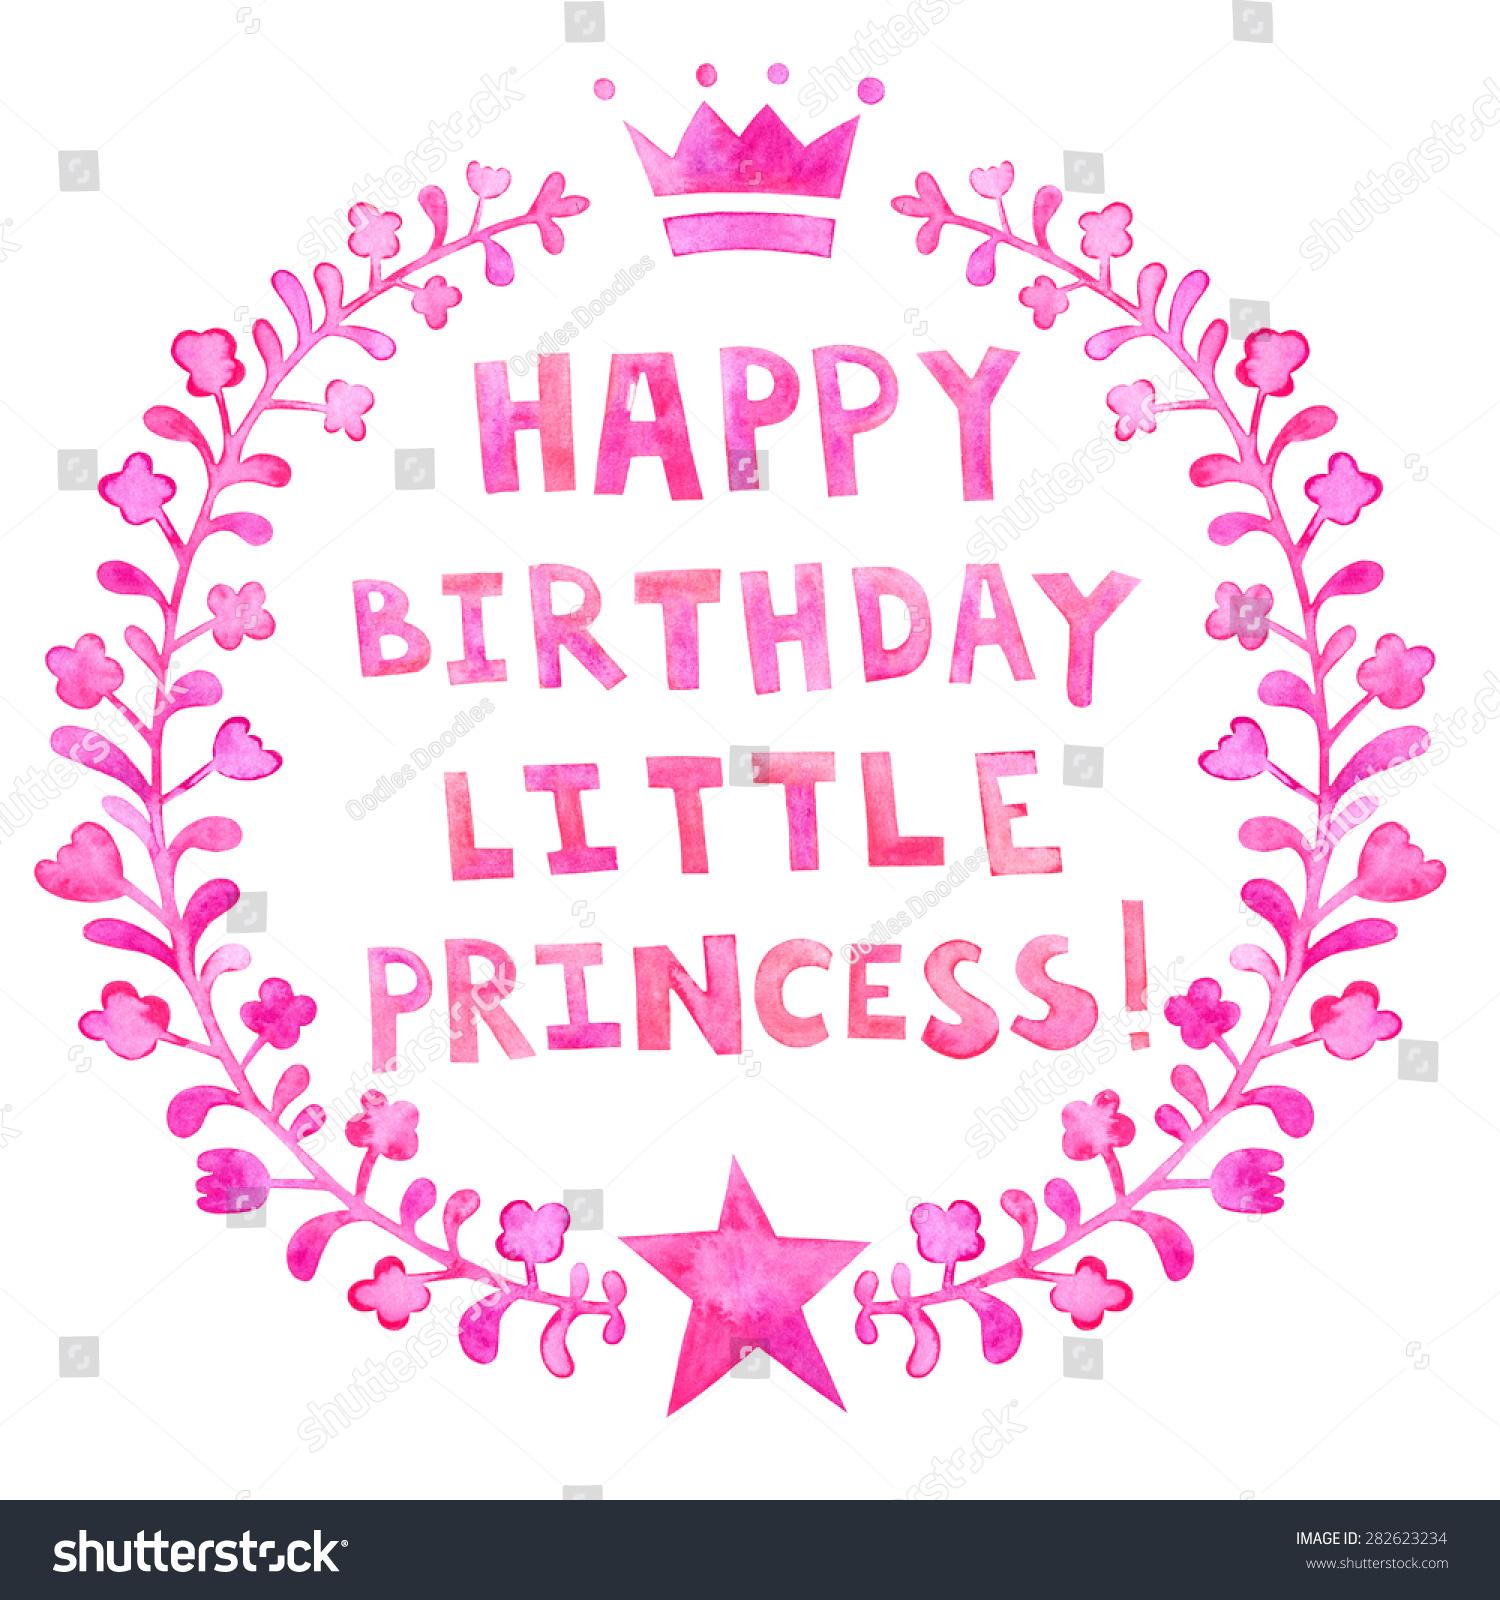 Happy Birthday Little Princess Watercolor Greeting Stock